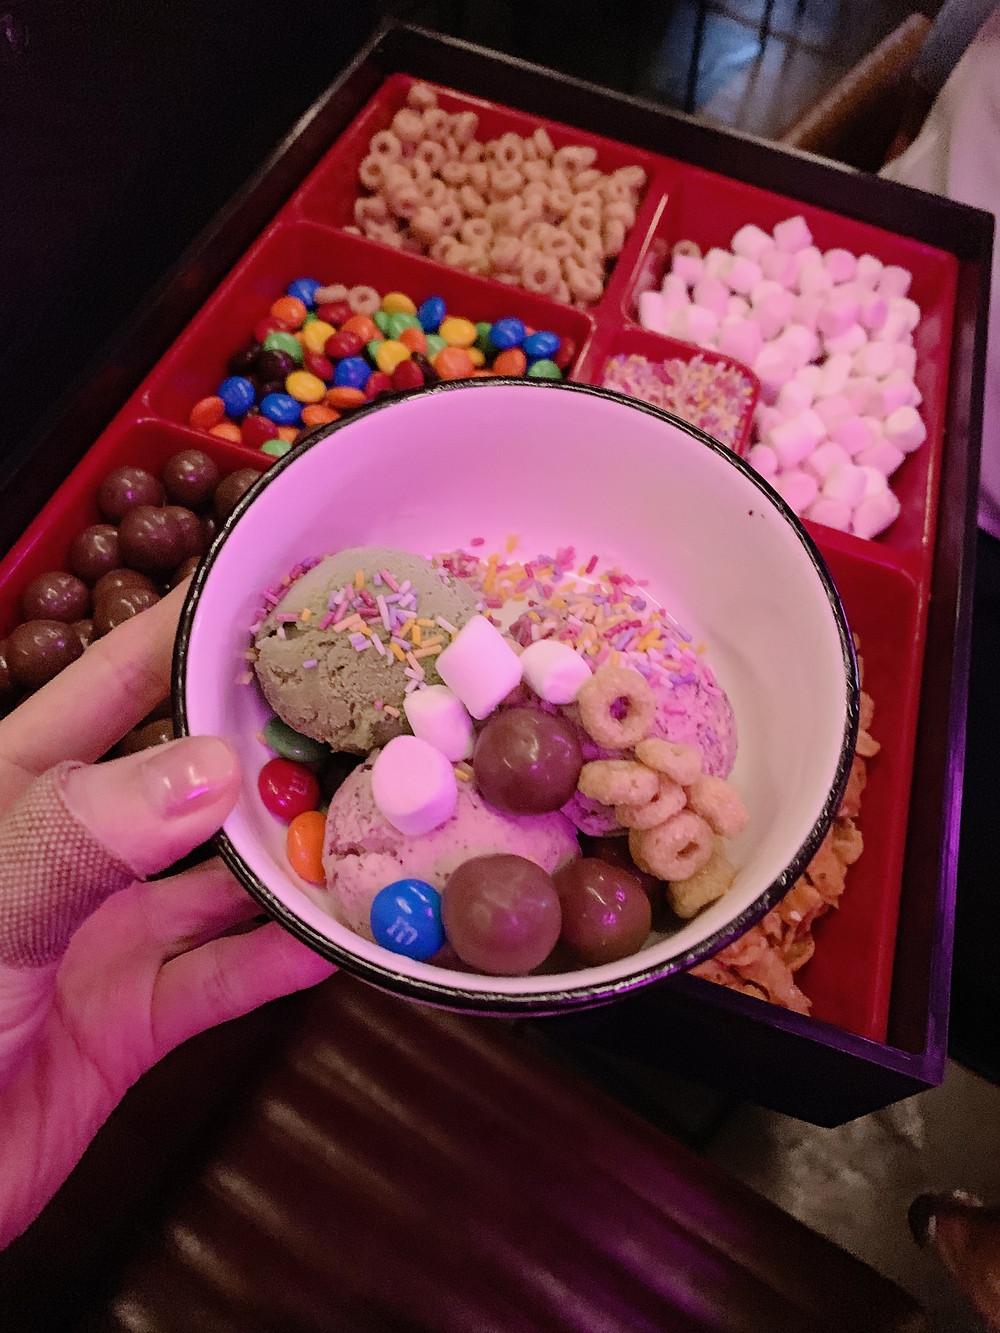 Ice cream at TMK Japanese sushi restaurant in Hong Kong